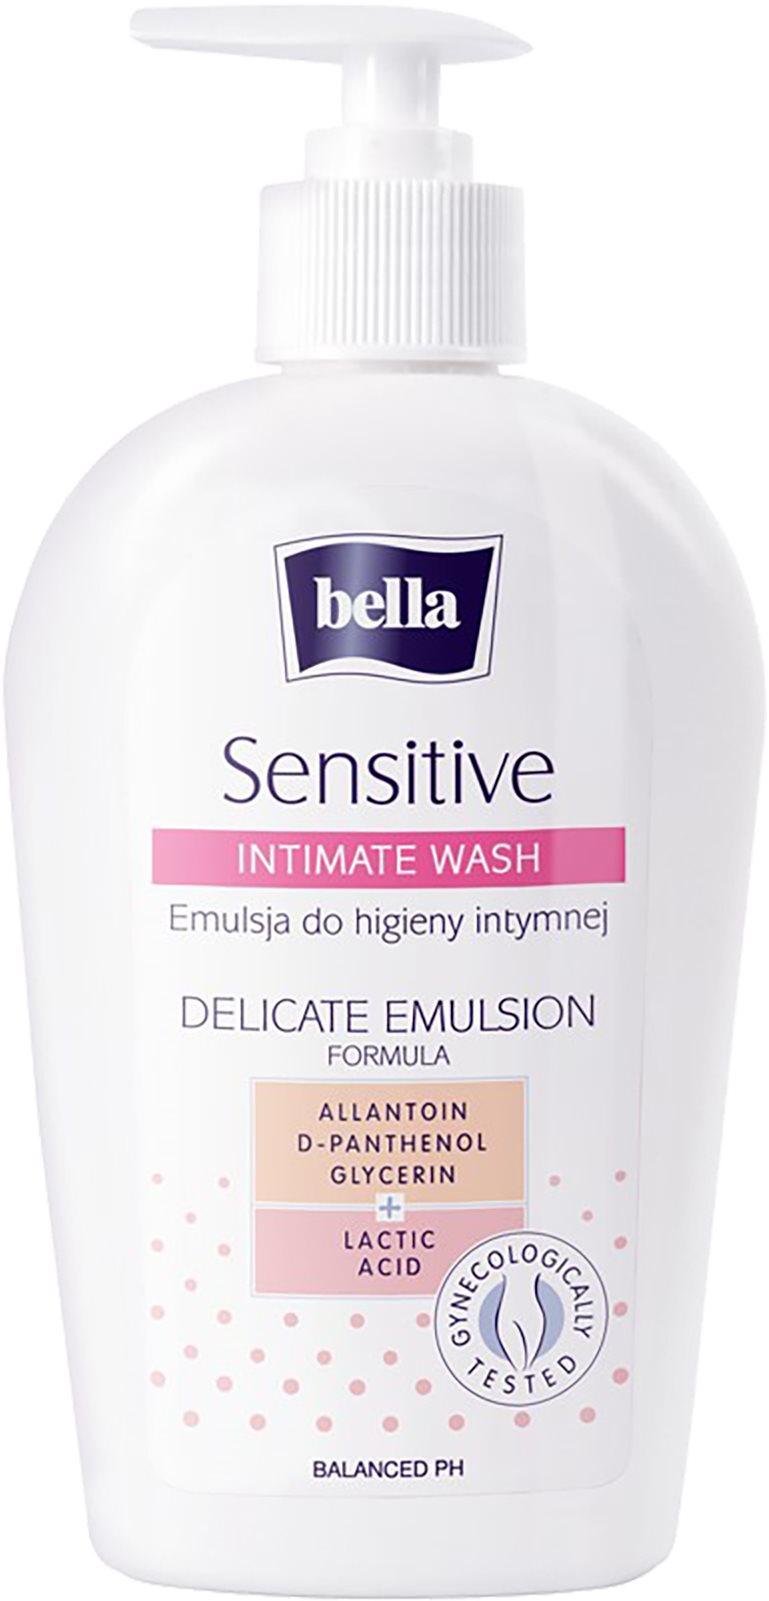 Bella Sensitive 300 ml